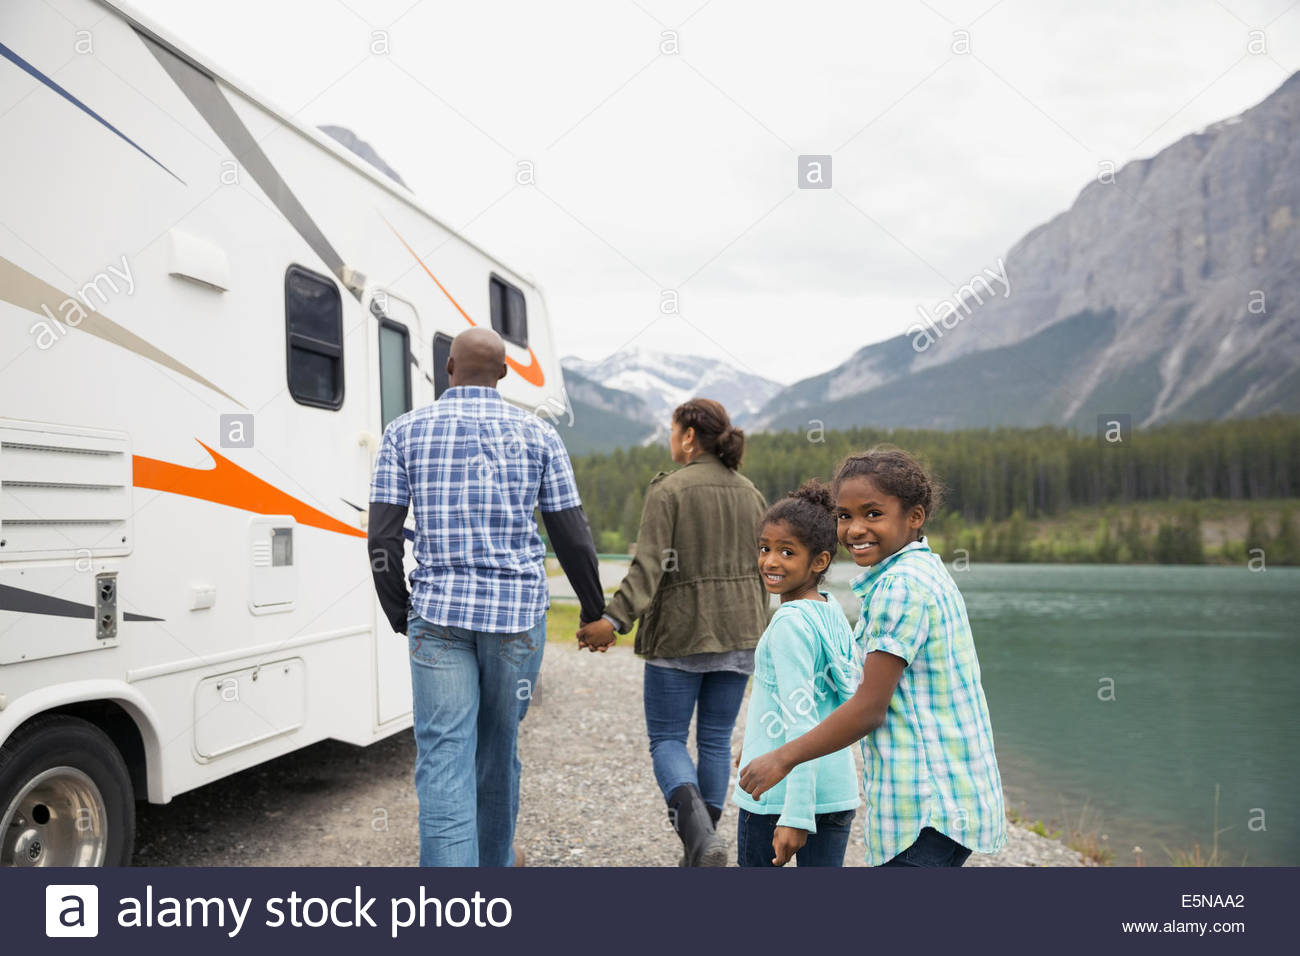 Family at lakeside walking toward RV - Stock Image